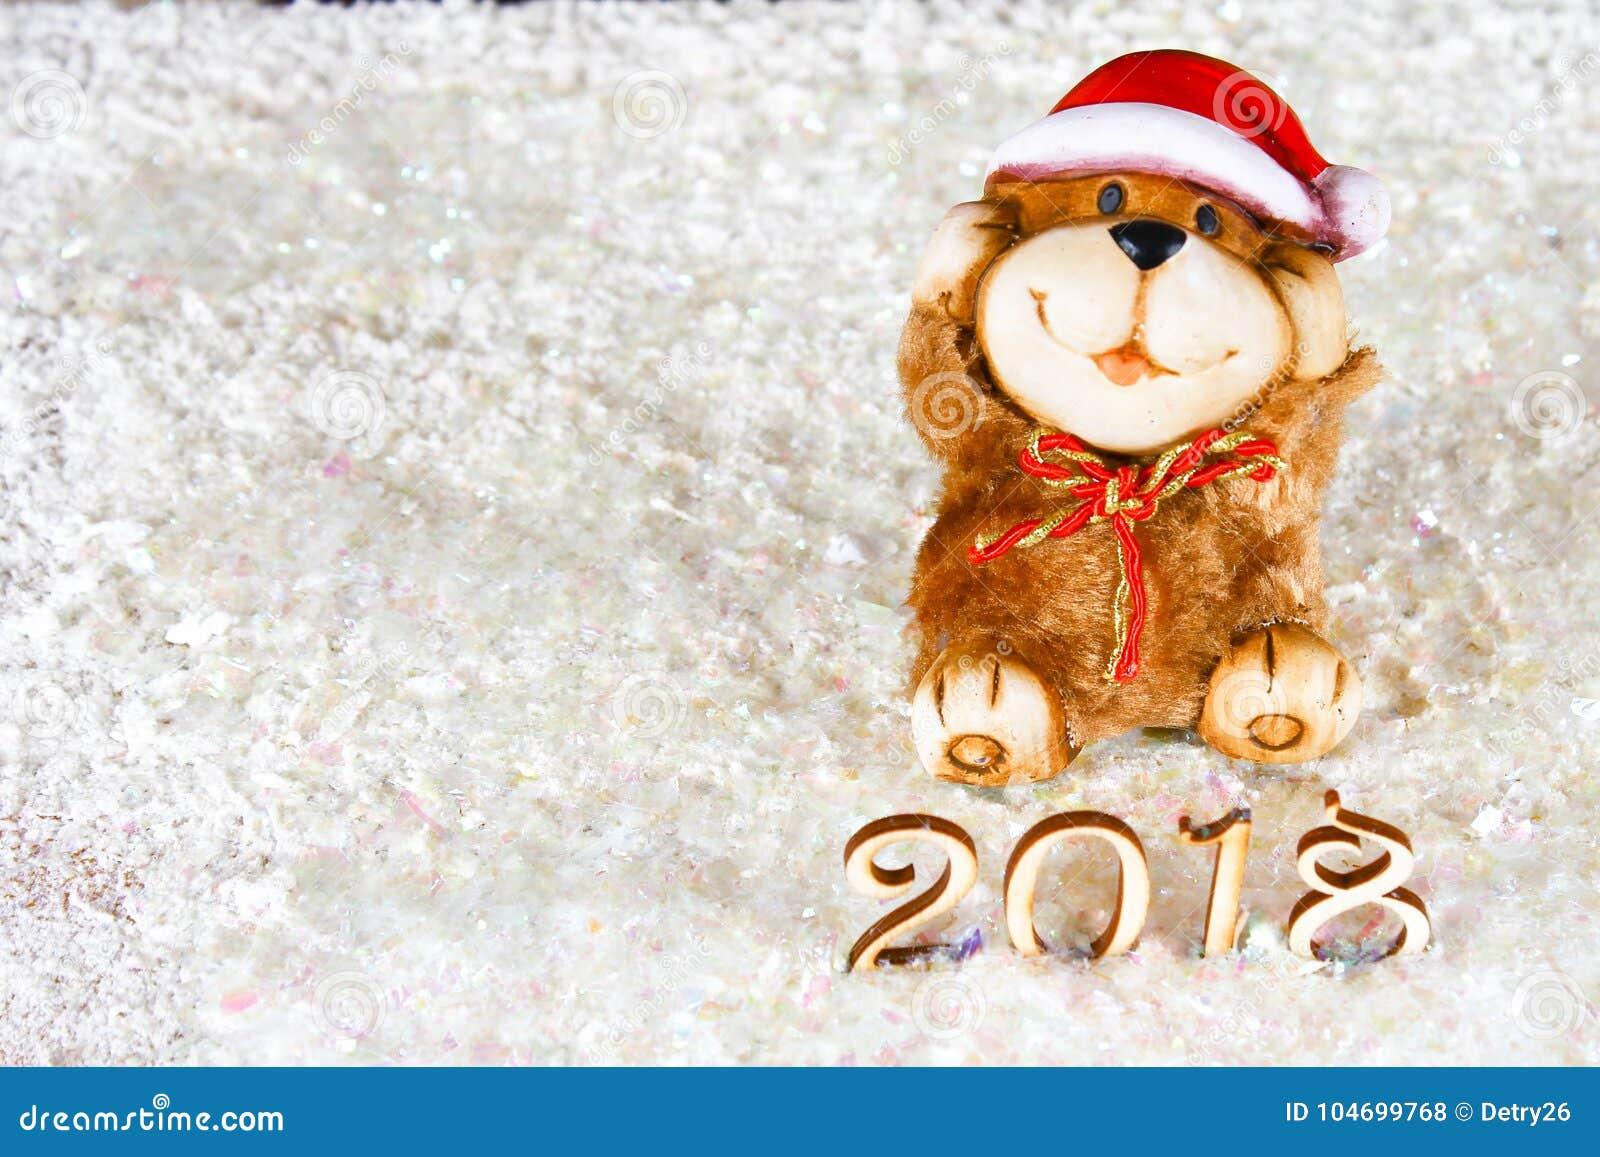 noel 2018 a la neige Chiffres En Bois De 2018 Sur La Neige L'atmosphère De Noël La  noel 2018 a la neige